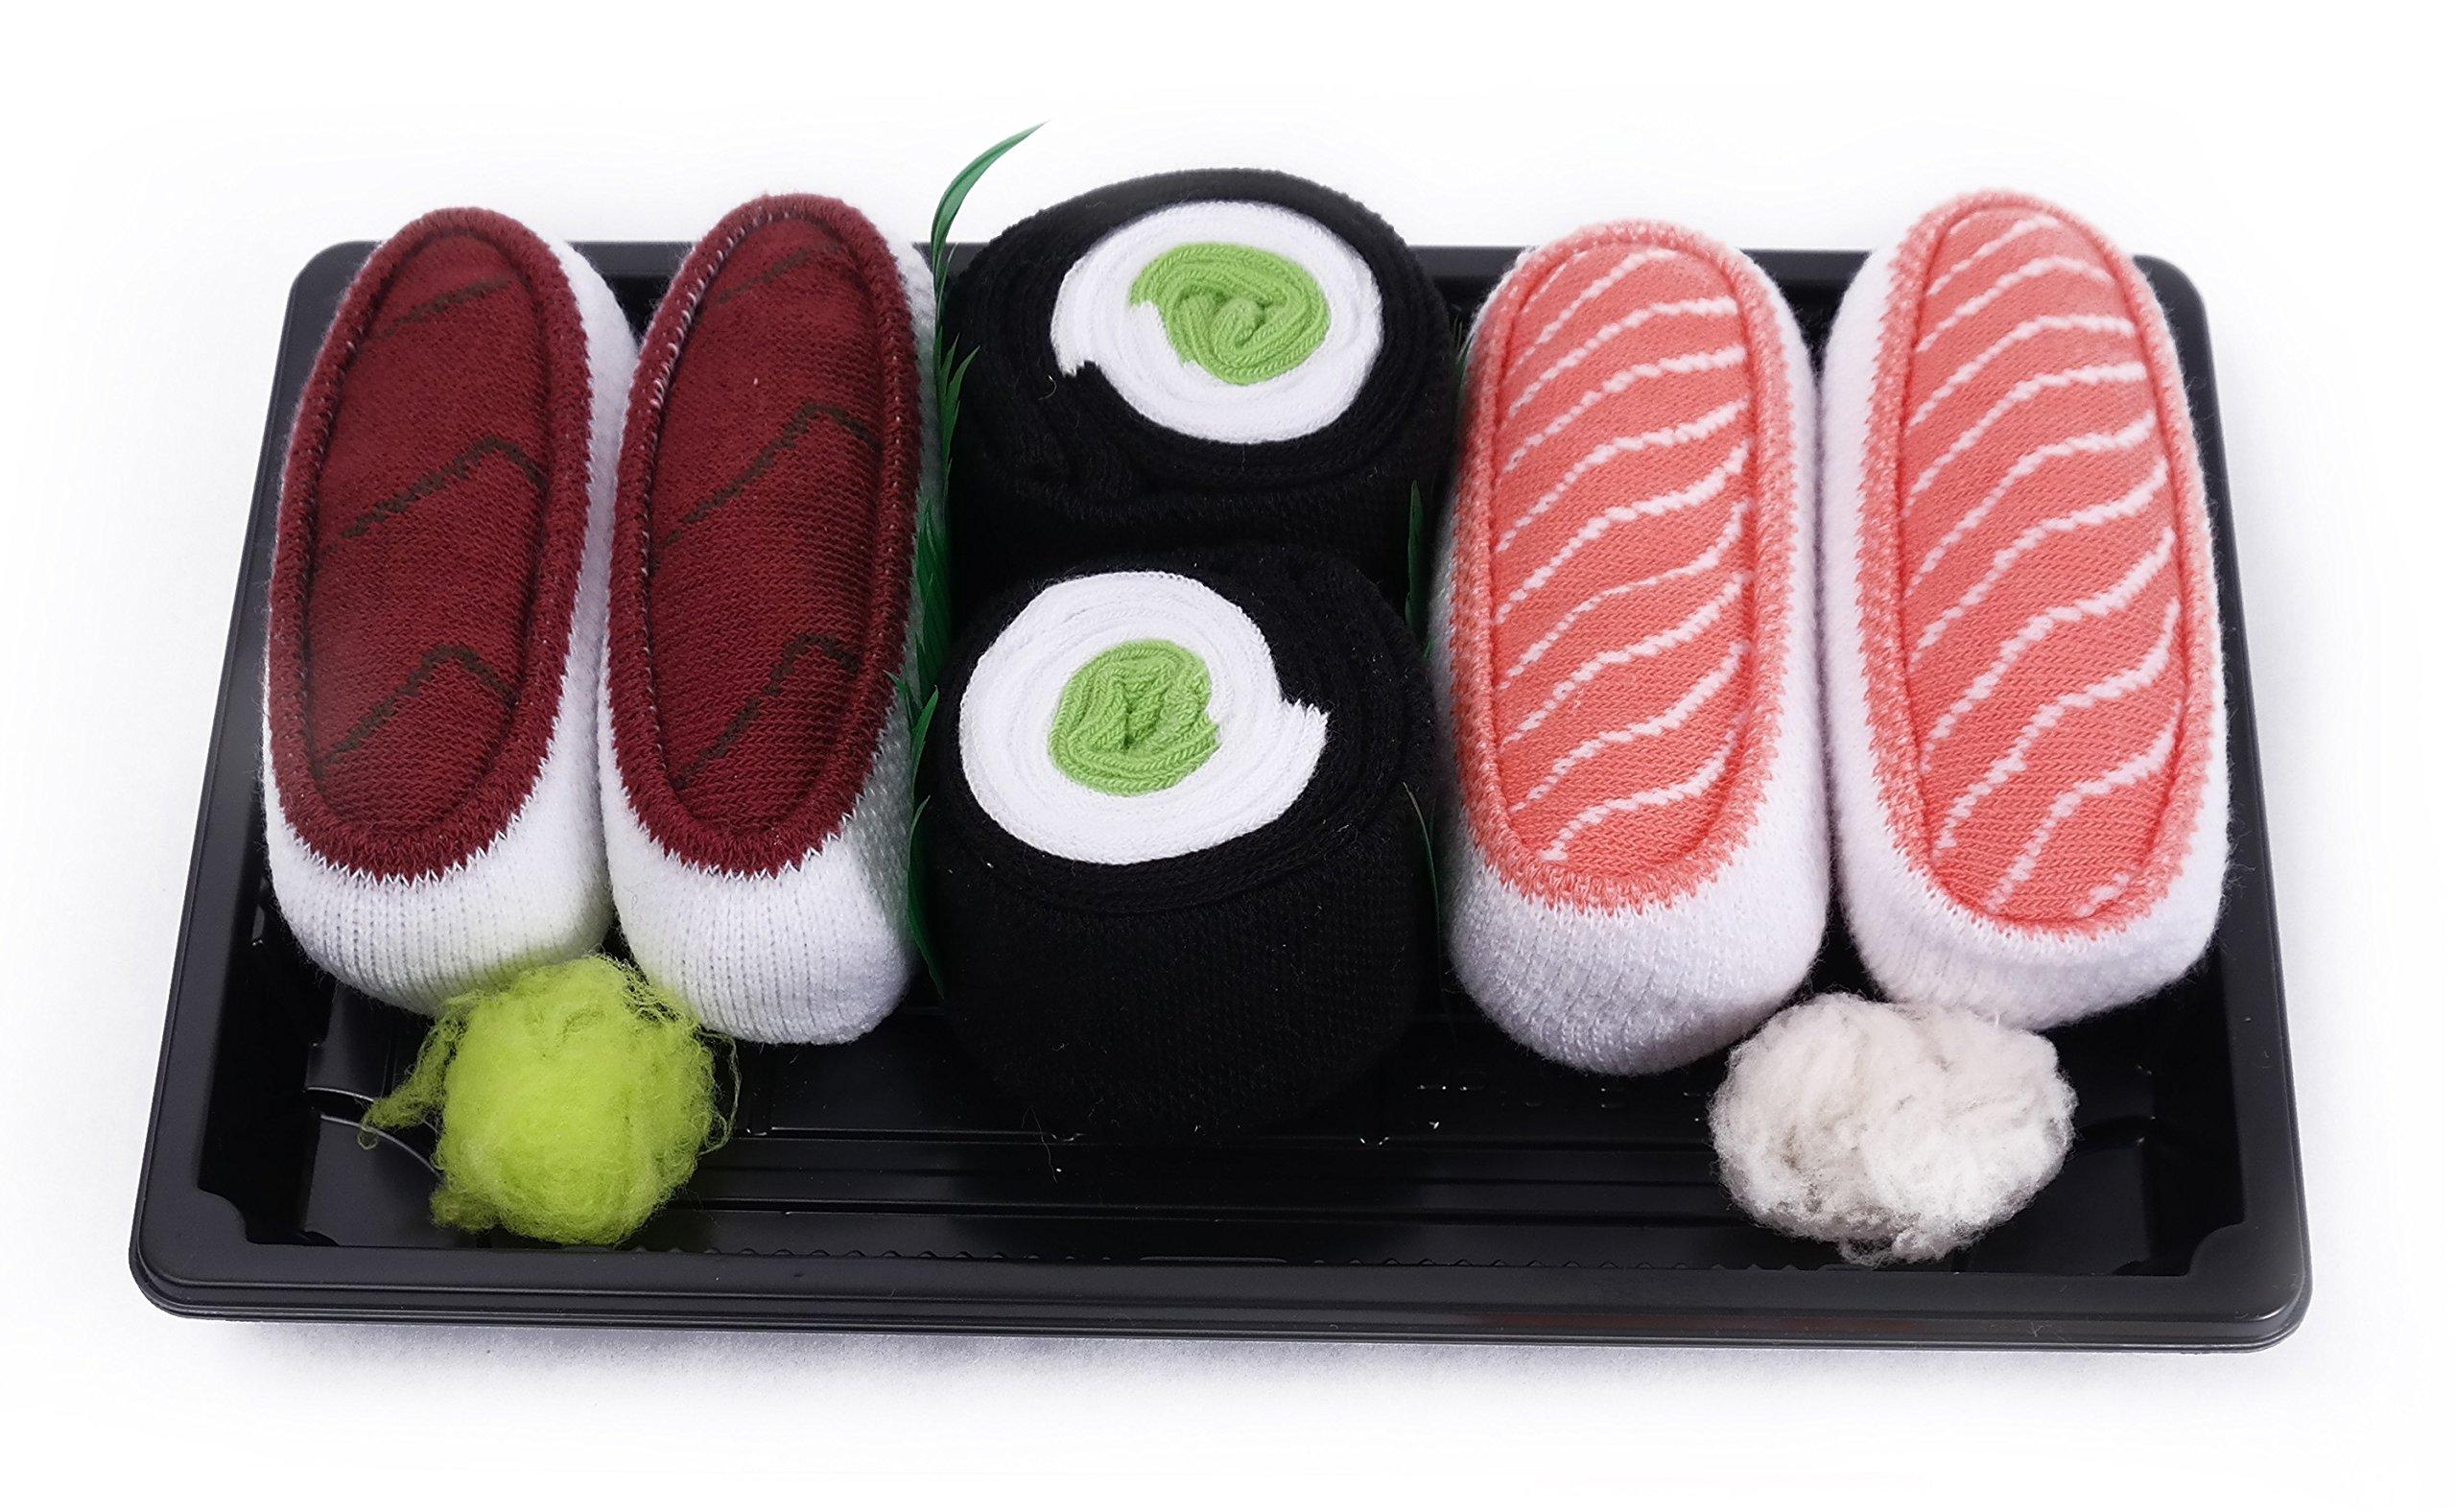 SUSHI SOCKS BOX 3 pairs Tuna Salmon Cucumber Maki FUNNY GIFT! Made in Europe S